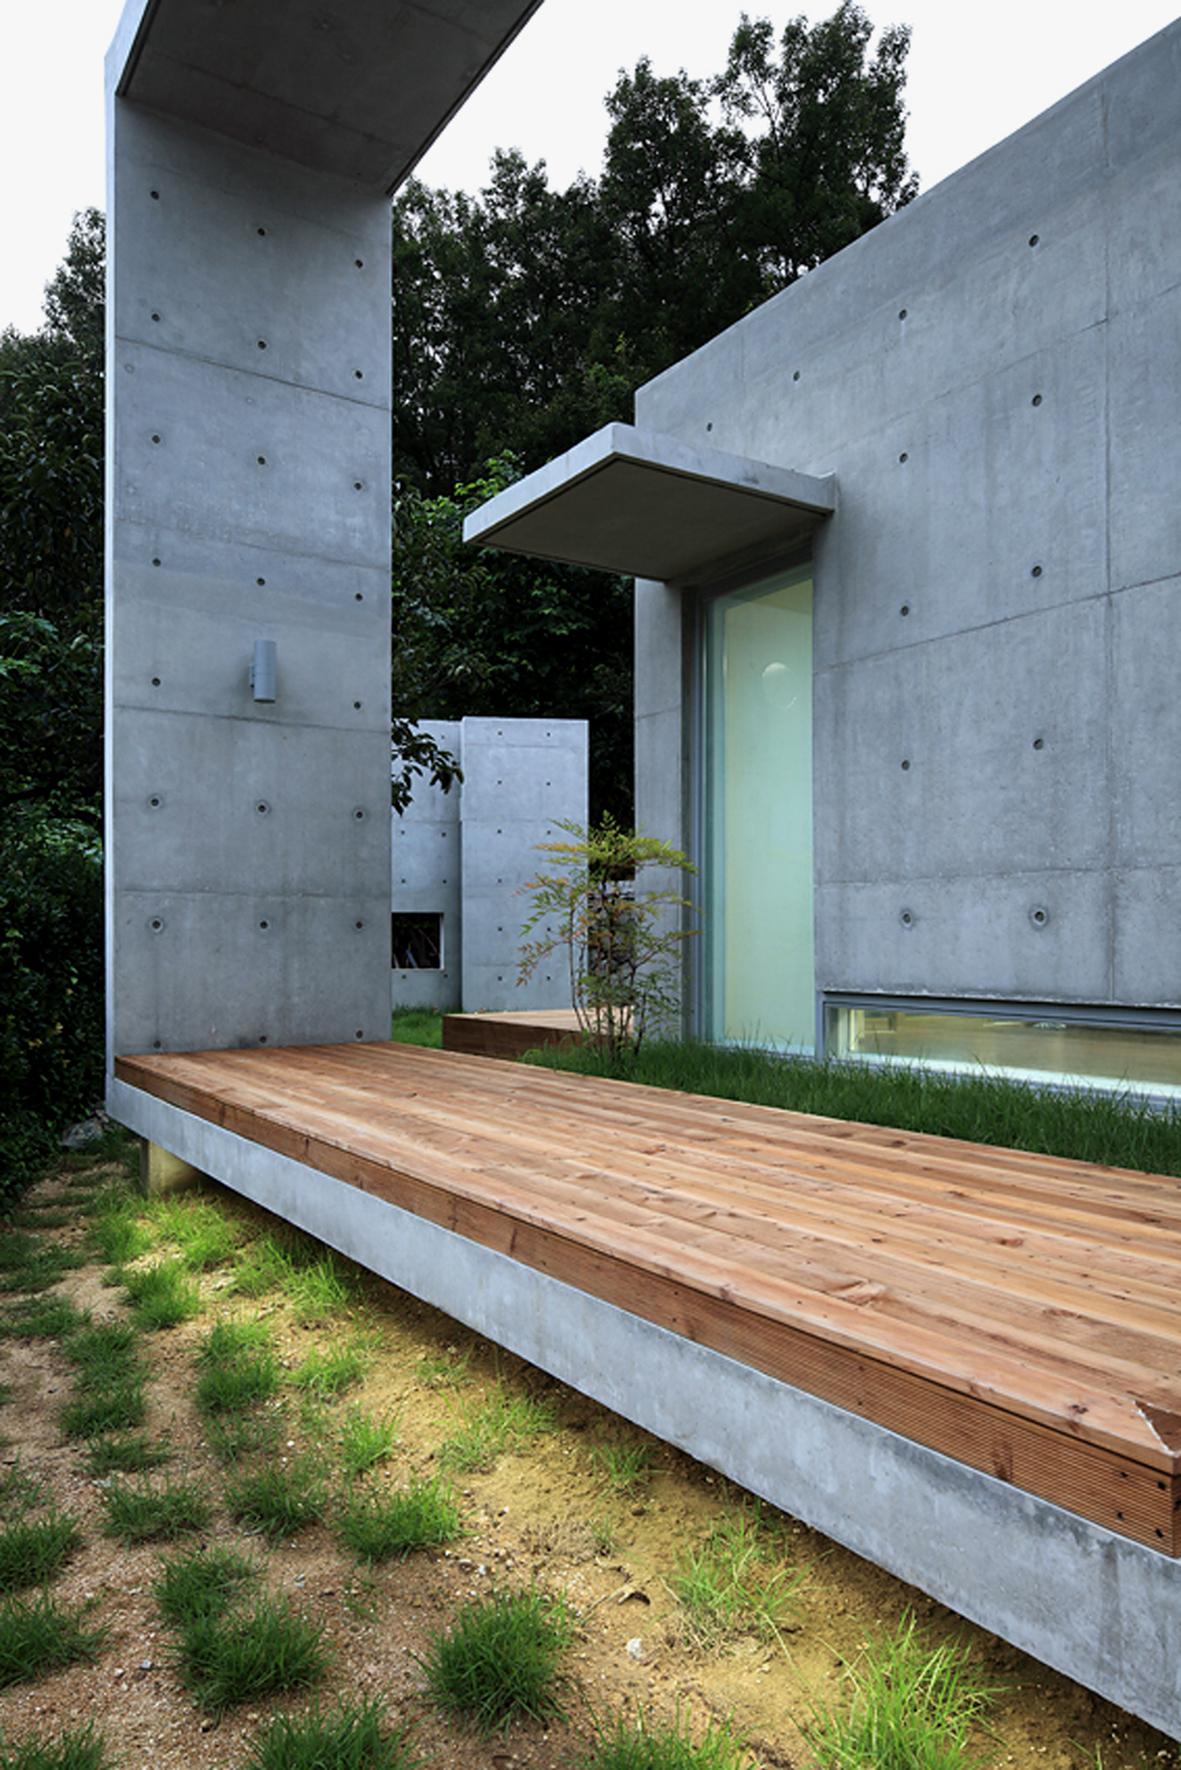 52f1a5e1e8e44e0b6d0000d7_mun-jeong-heon-a-m-architects_a6